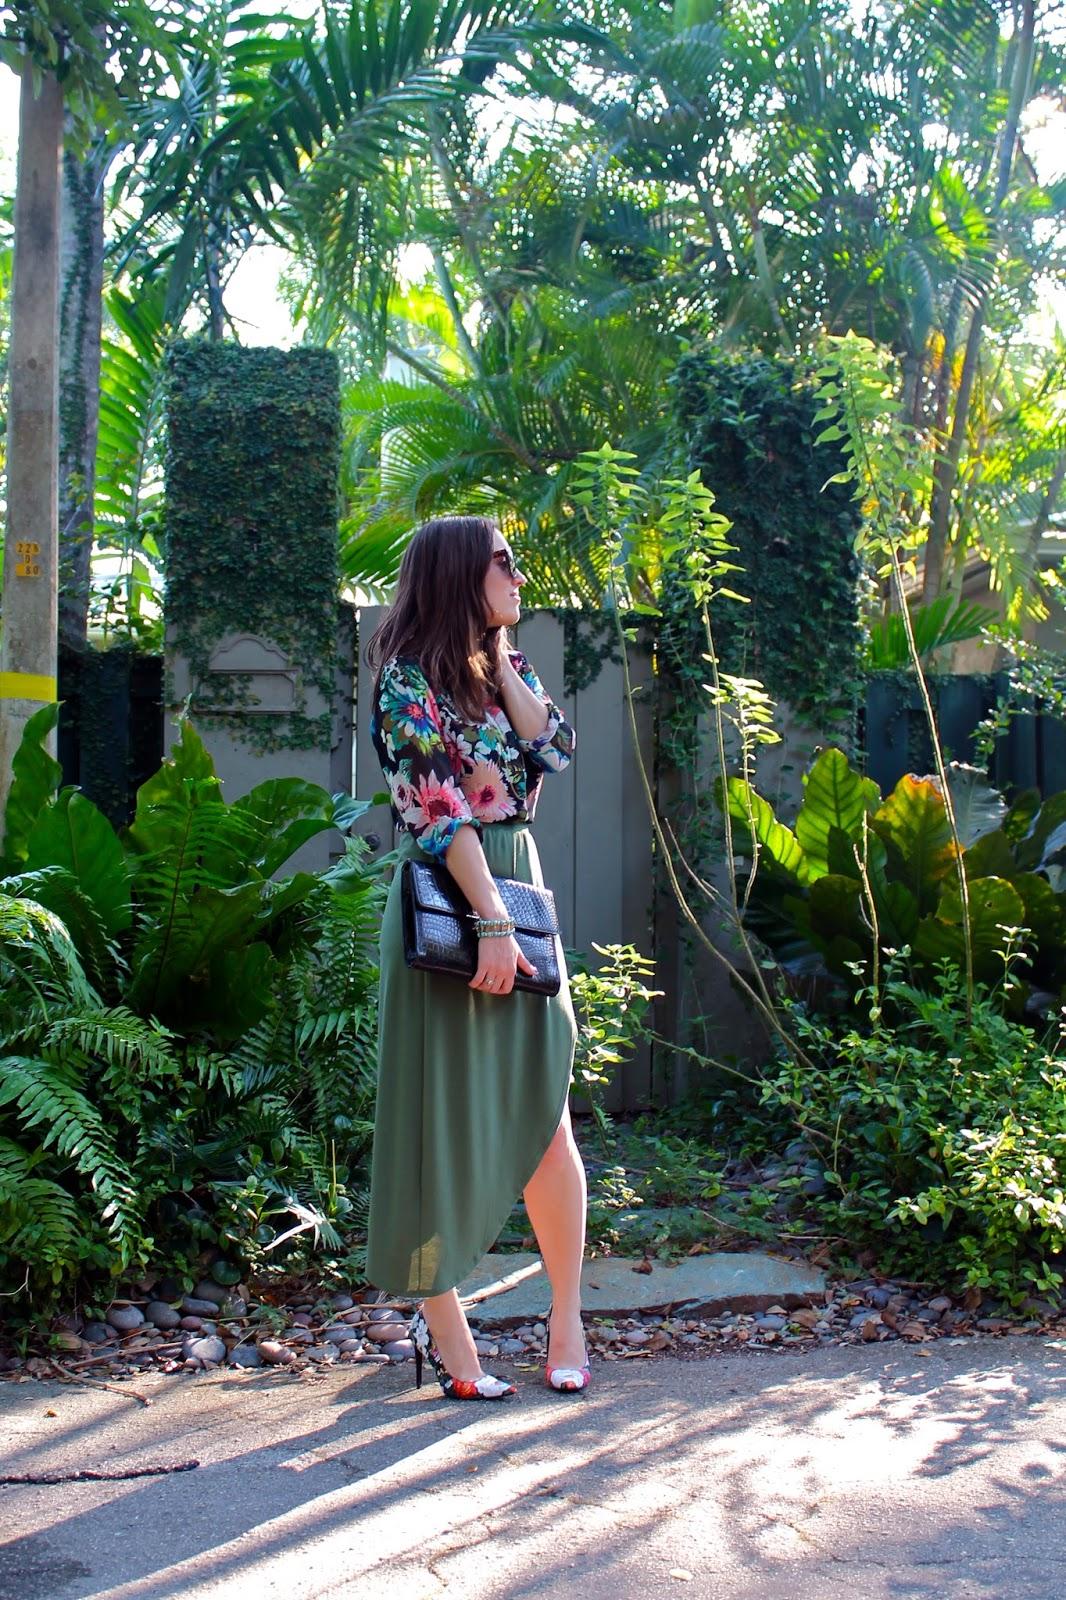 H&M, Stella & Dot, Omega, Target, Halogen, Macy's, nordstrom, fashion blog, style blog, fashion blogger, style blogger, ootd, fall fashion, fall trends, outfit ideas, Miami fashion blogger